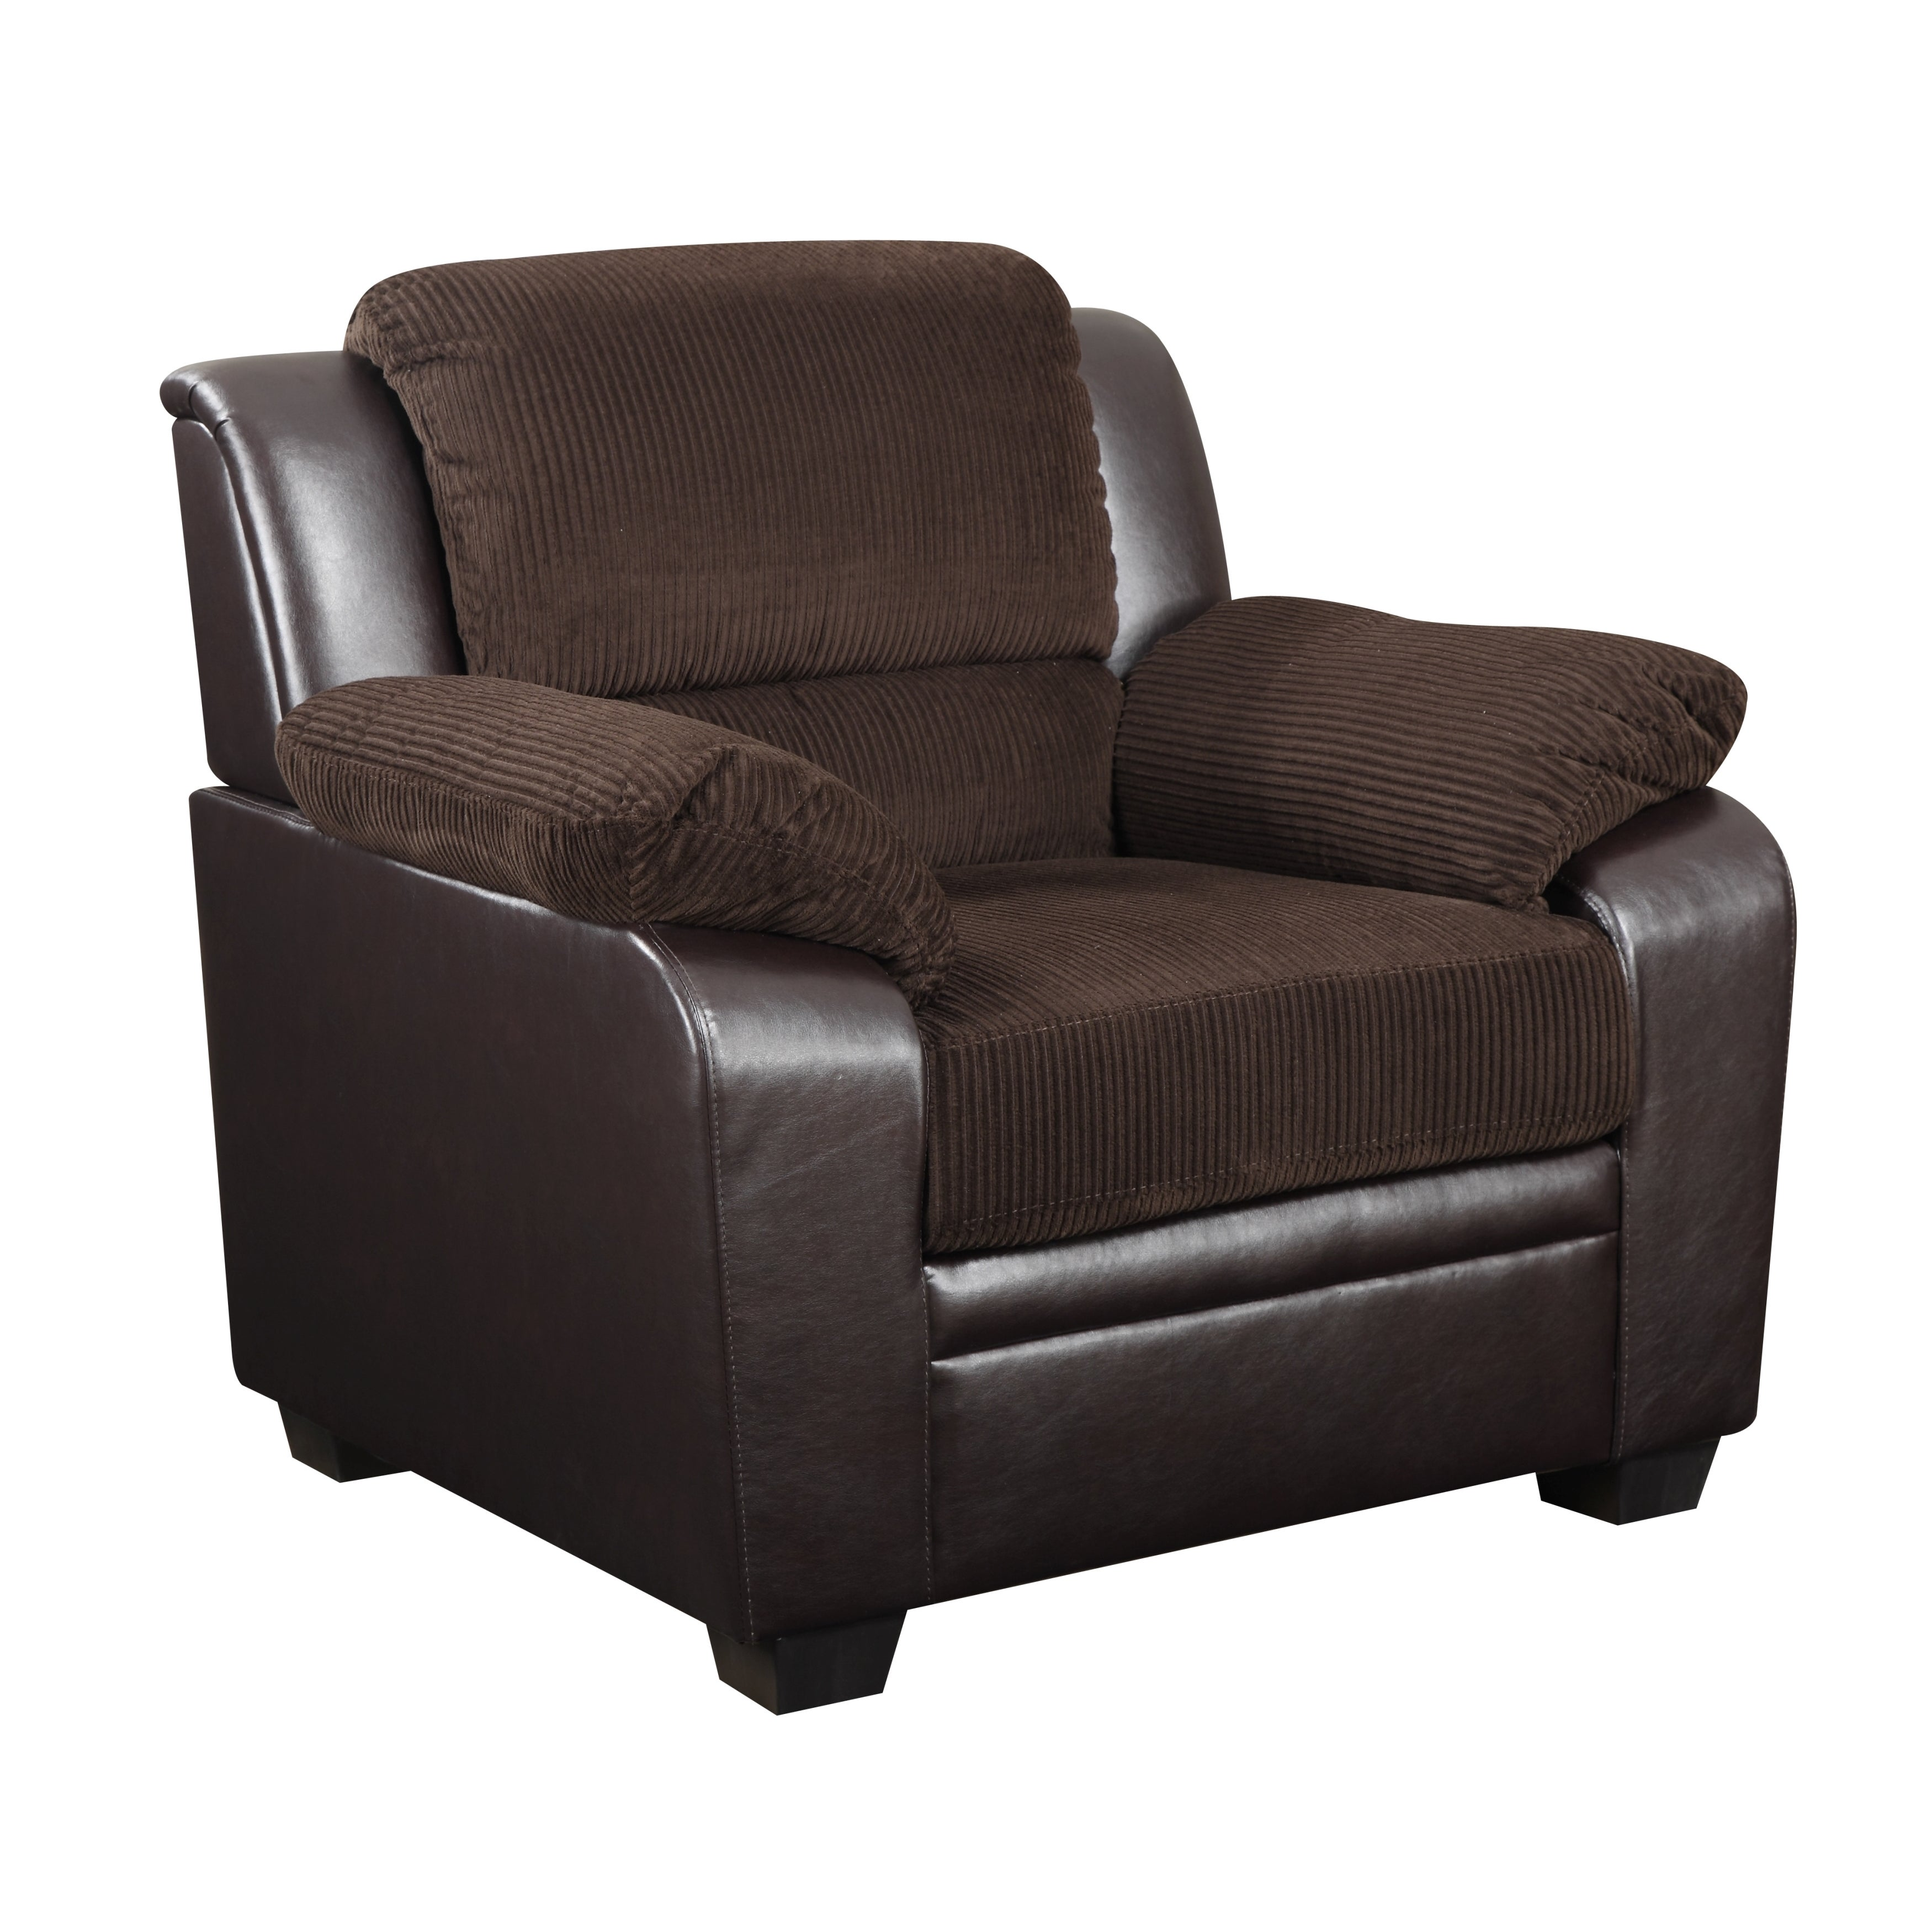 Overstock.com Chocolate Brown Corduroy Chair at Sears.com